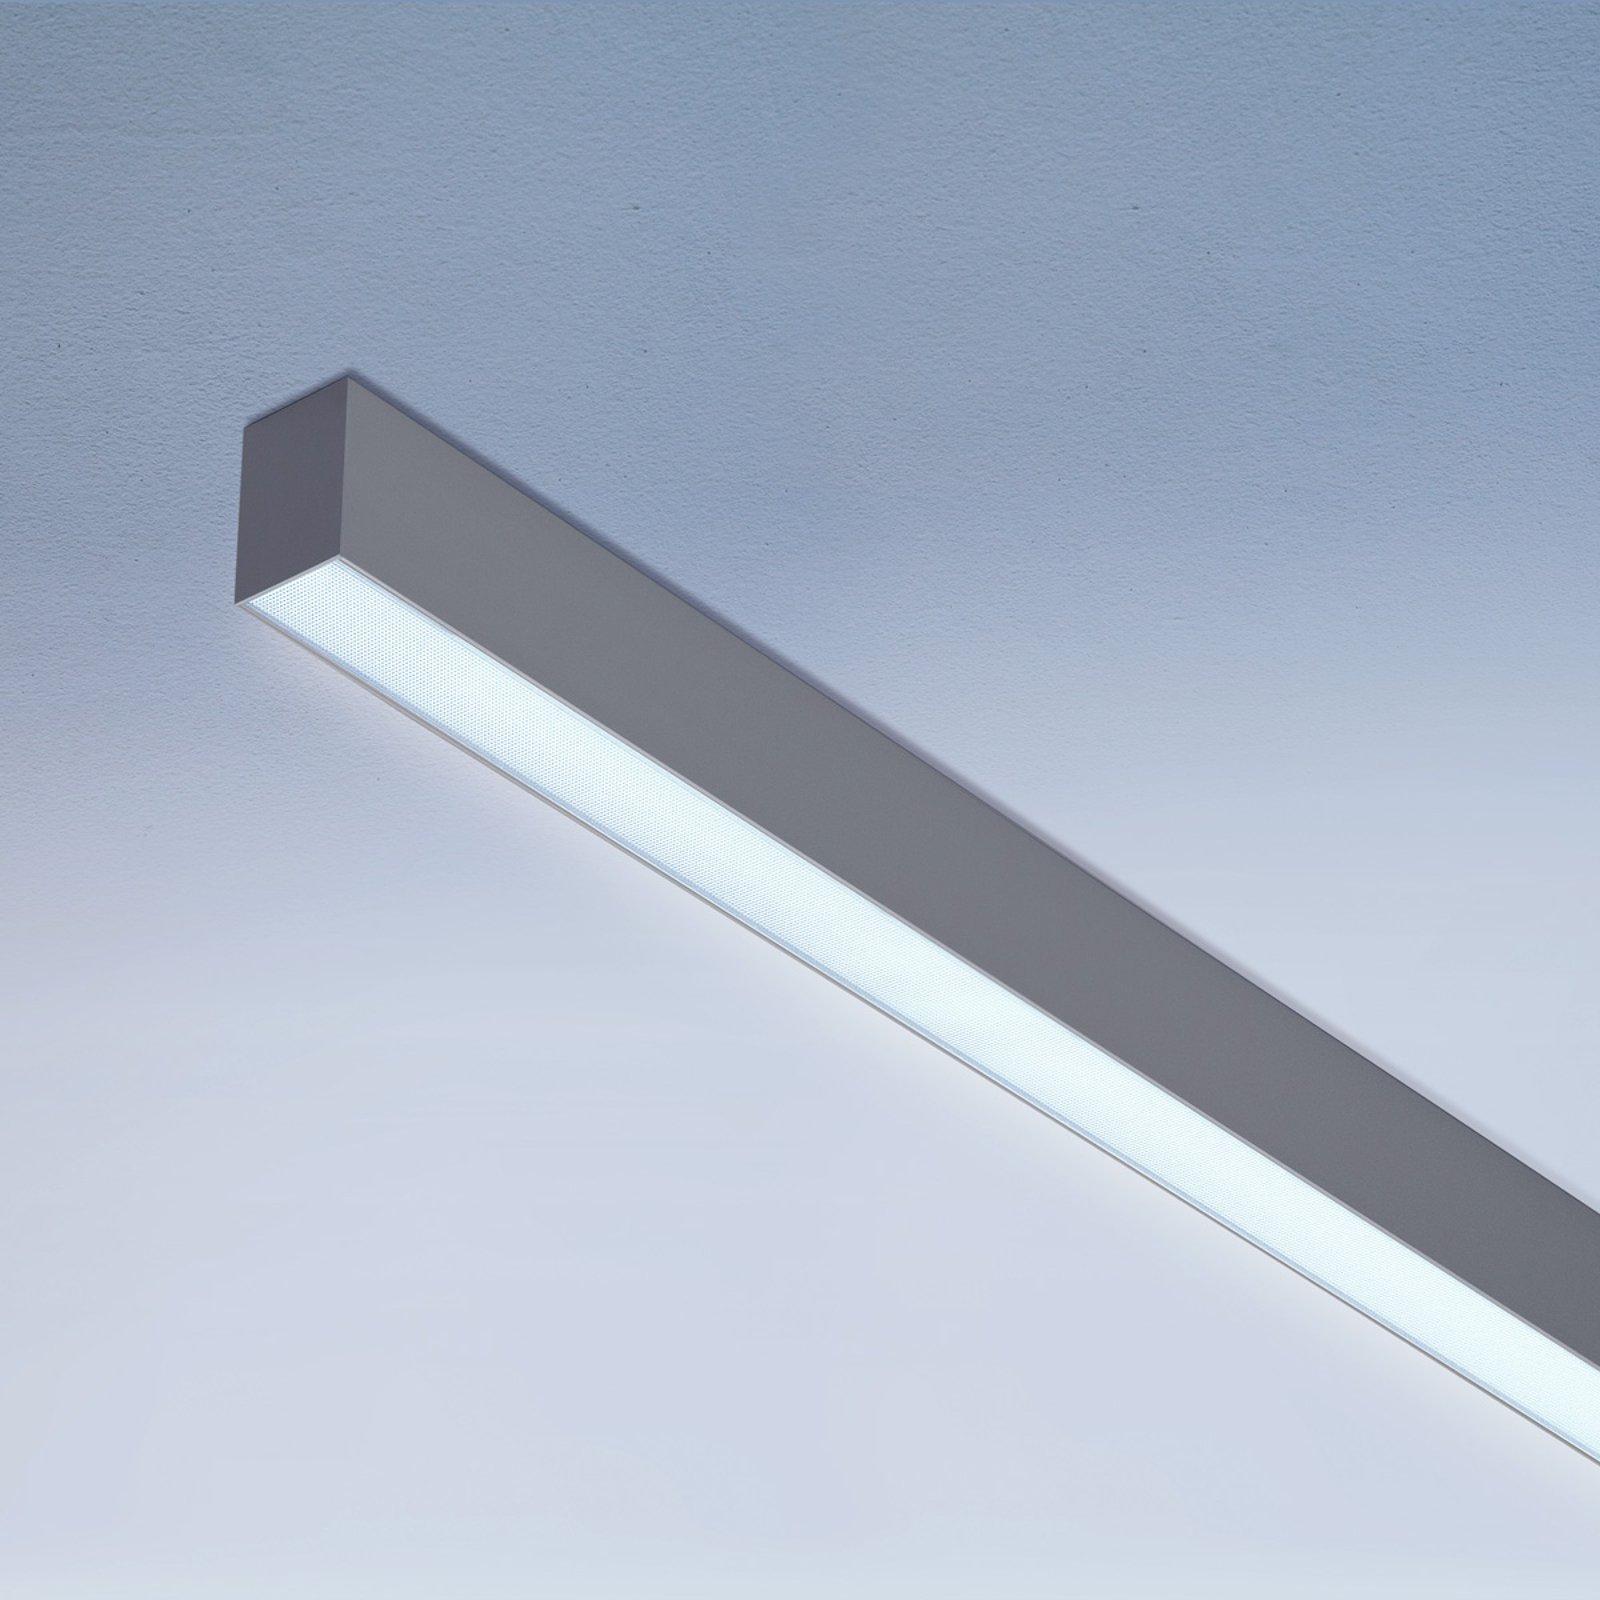 Medium Power Matric-A3 - LED-vegglampe 176,5 cm